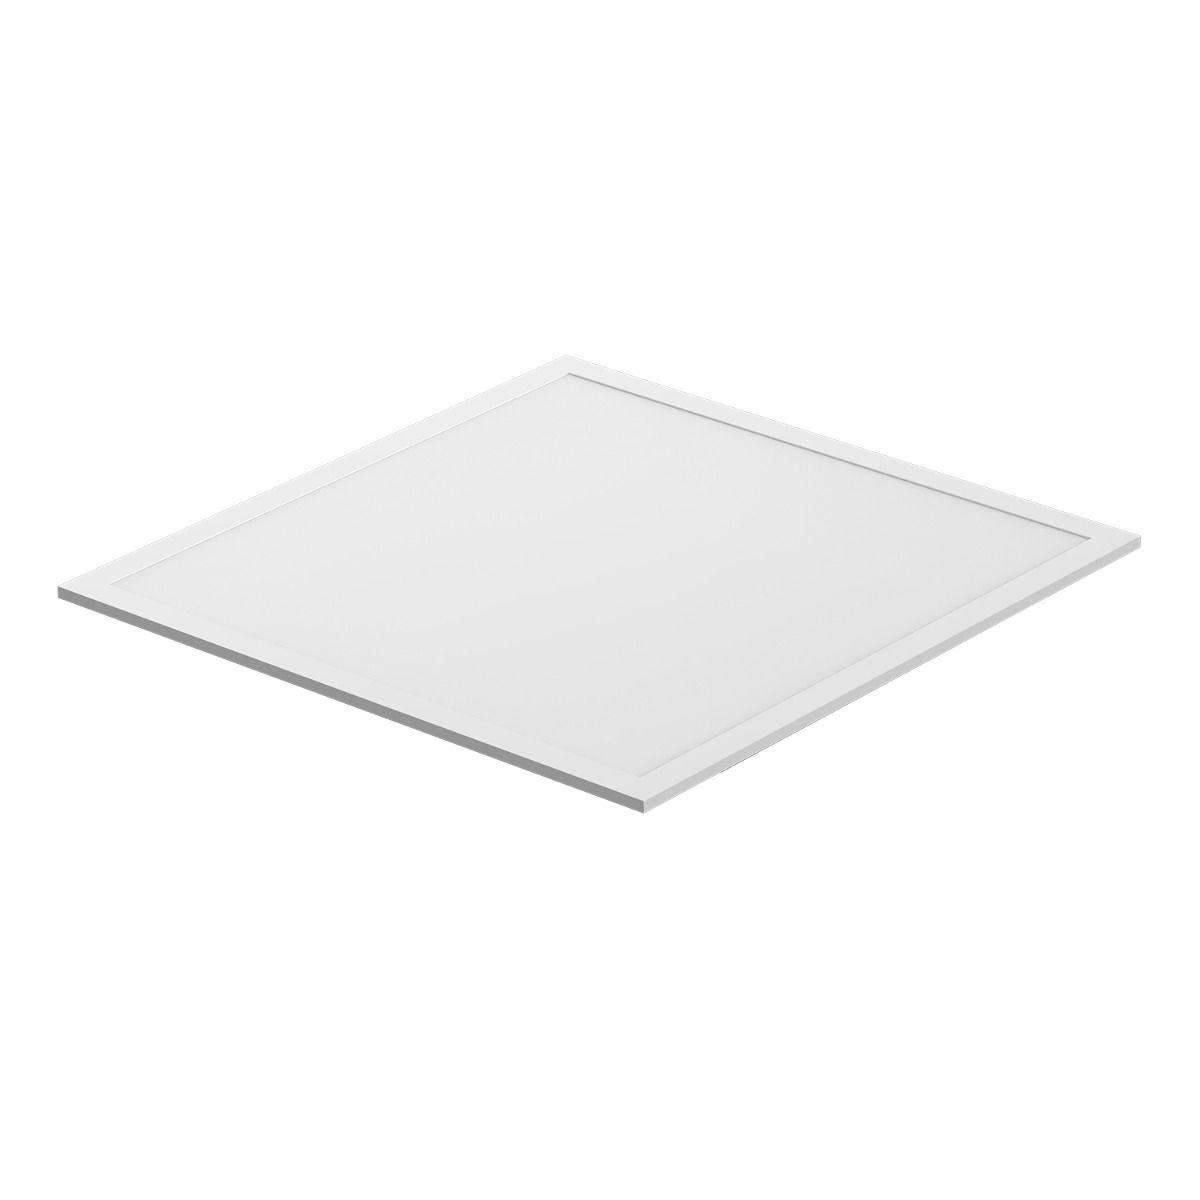 Noxion LED Panel Delta Pro Highlum V2.0 Xitanium DALI 40W 60x60cm 3000K 5280lm UGR <19 | Dali Dimmable - Warm White - Replaces 4x18W